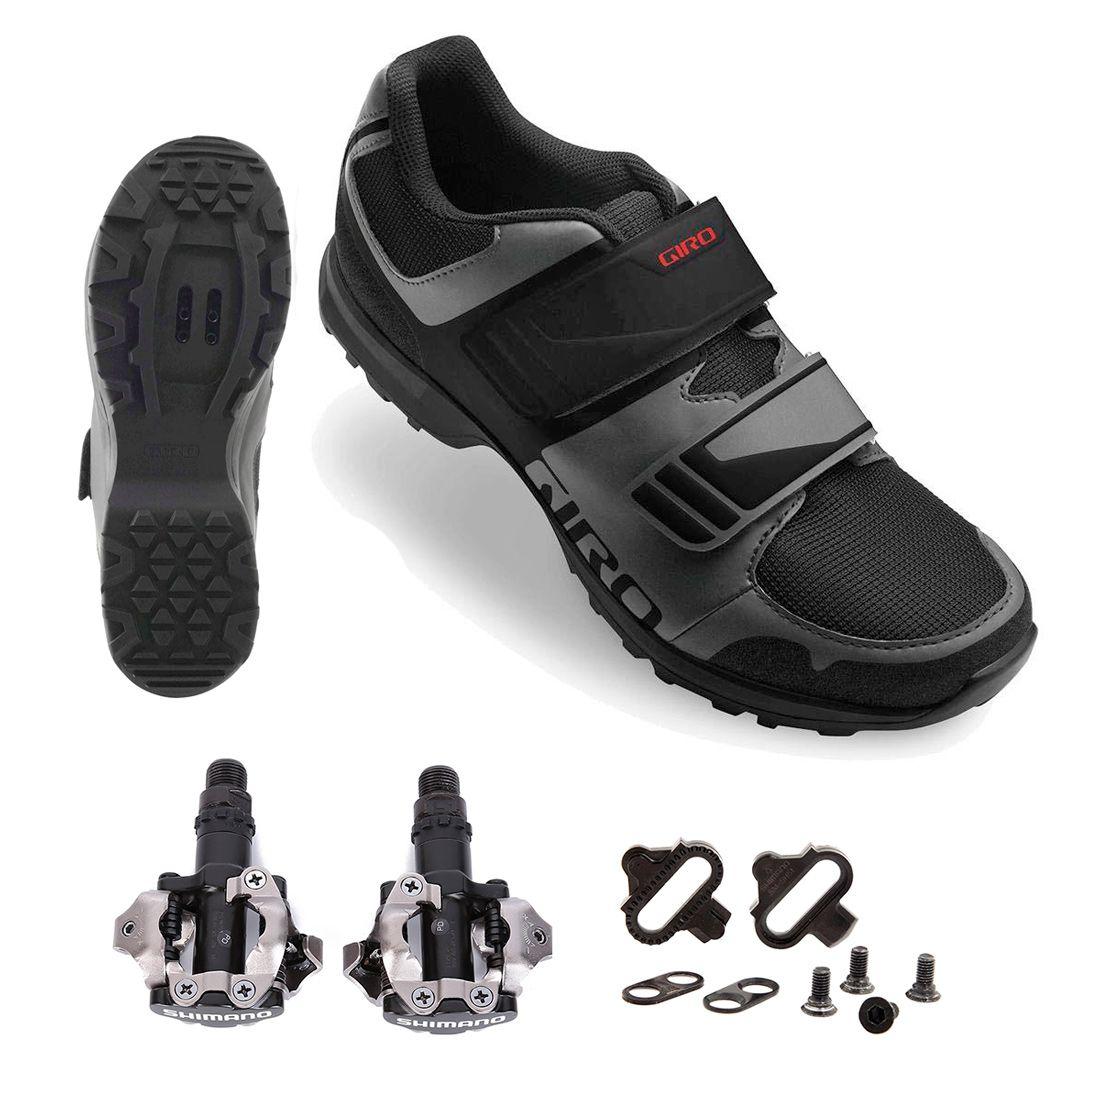 Sapatilha Giro Berm MTB + Pedal Shimano PD-M520 + Tacos ME2 ME3